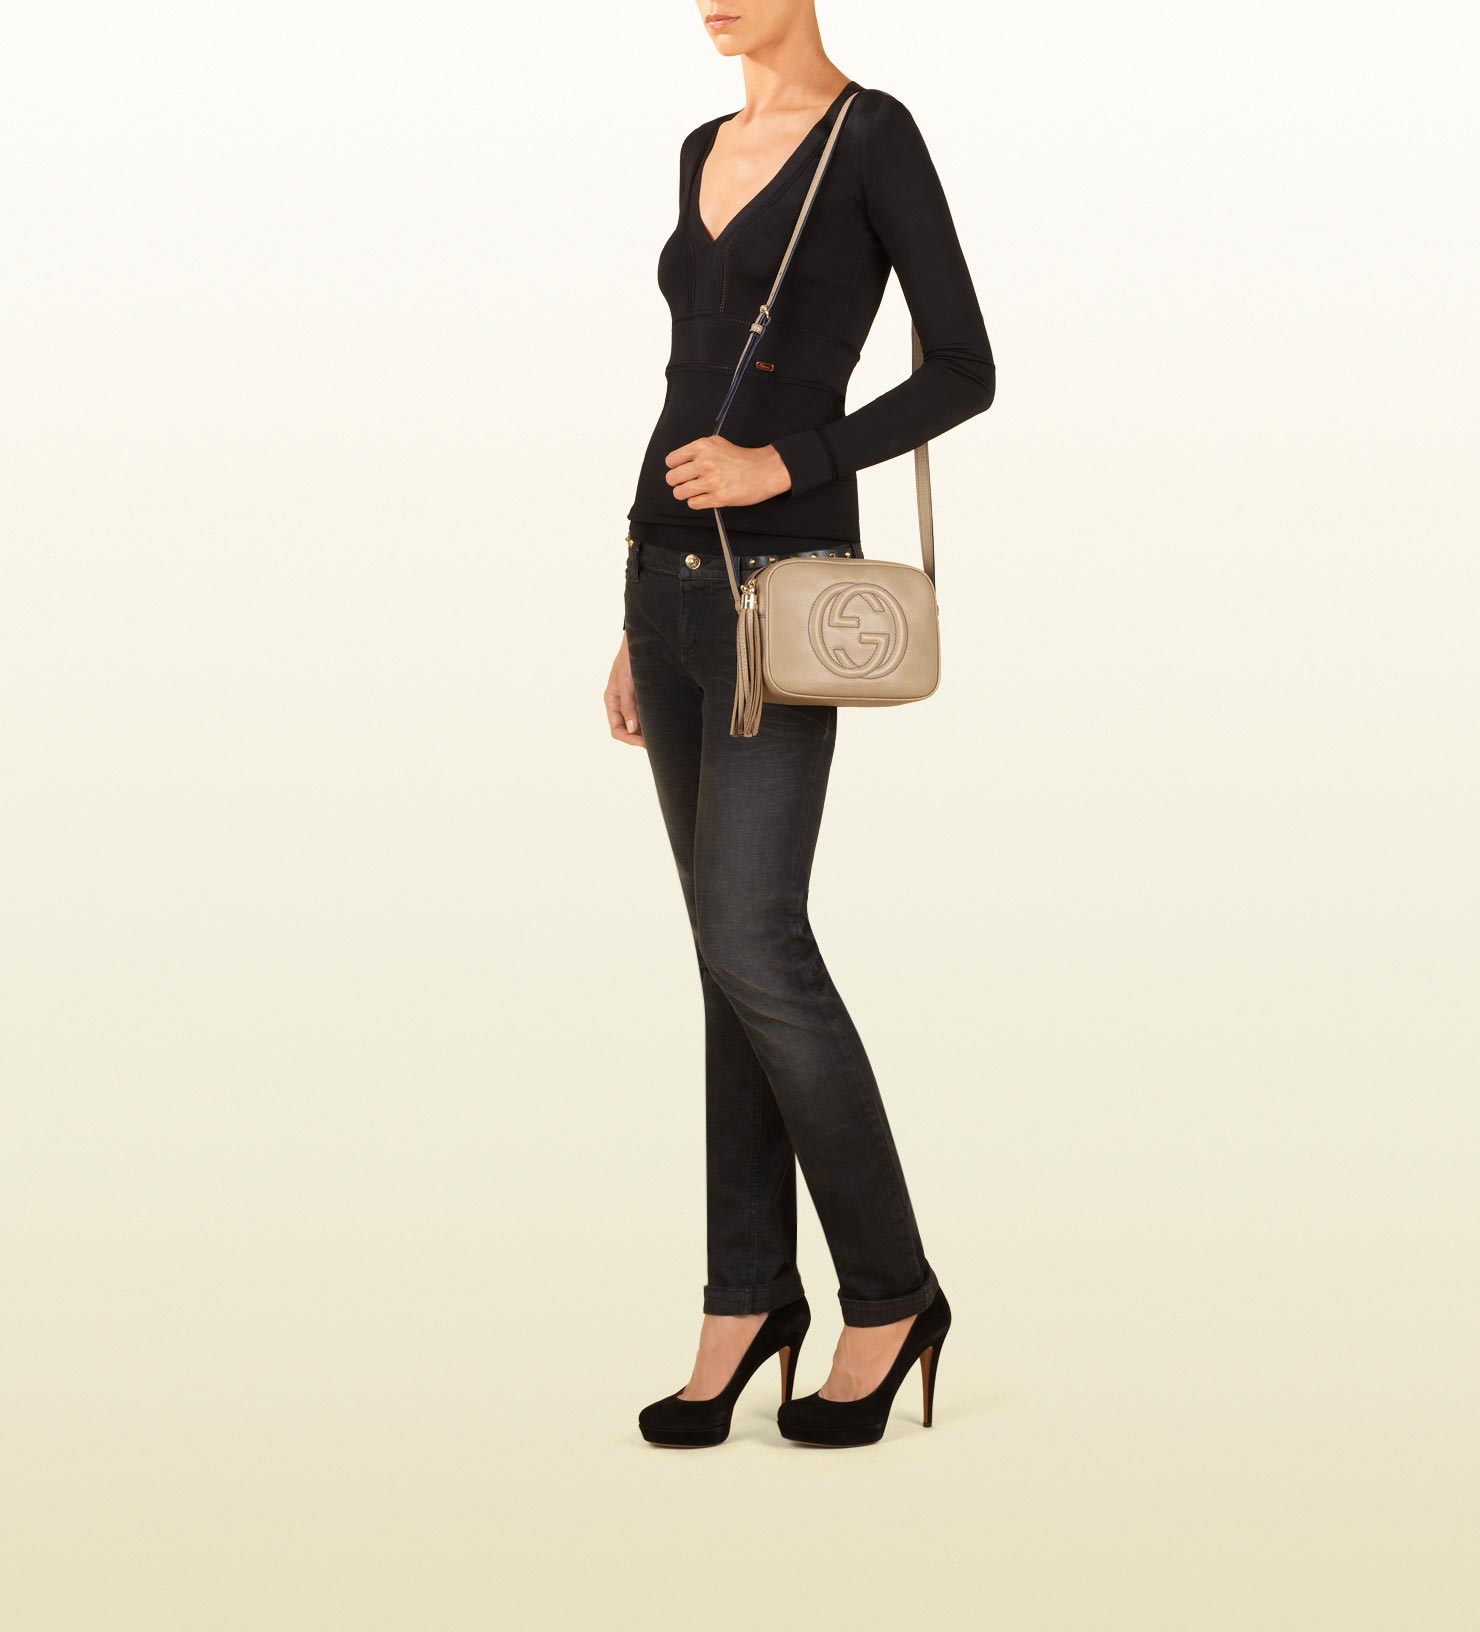 204e765ef52cdd Gucci Soho Cream Leather Disco Bag in Natural - Lyst